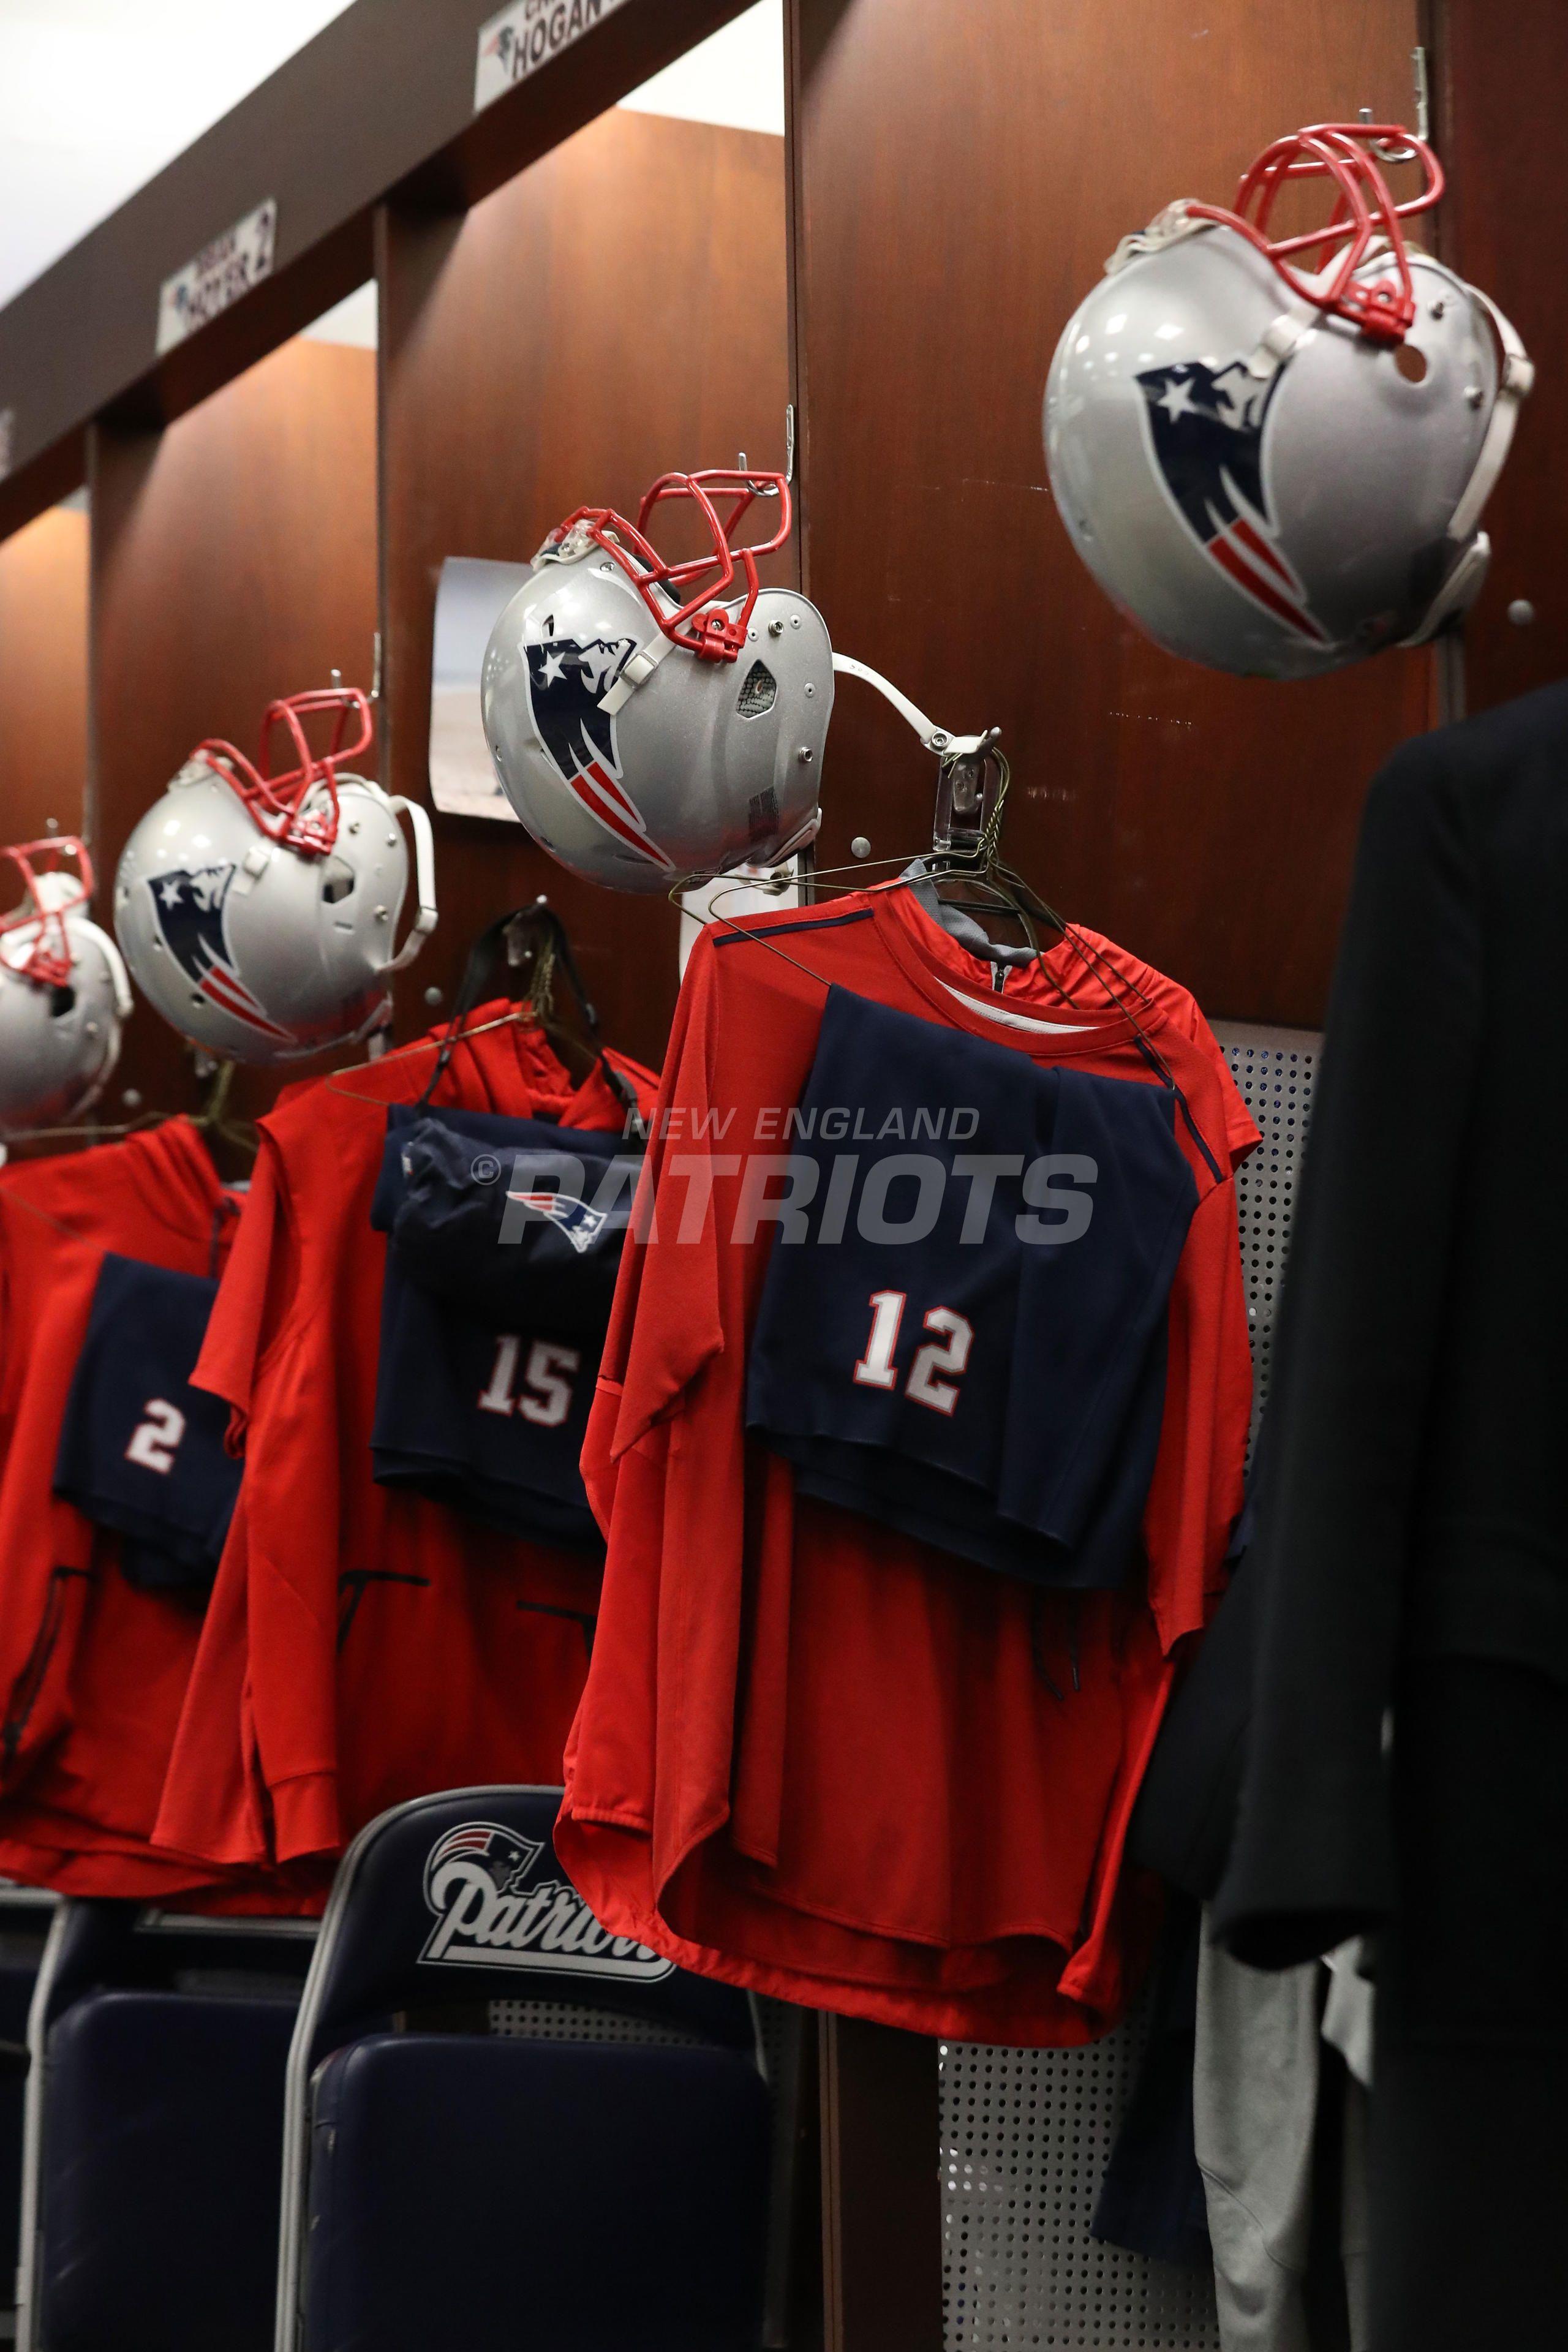 Pregame Inside The Patriots Locker Room And Player Arrivals 1 13 Patriots Locker Room Lockers